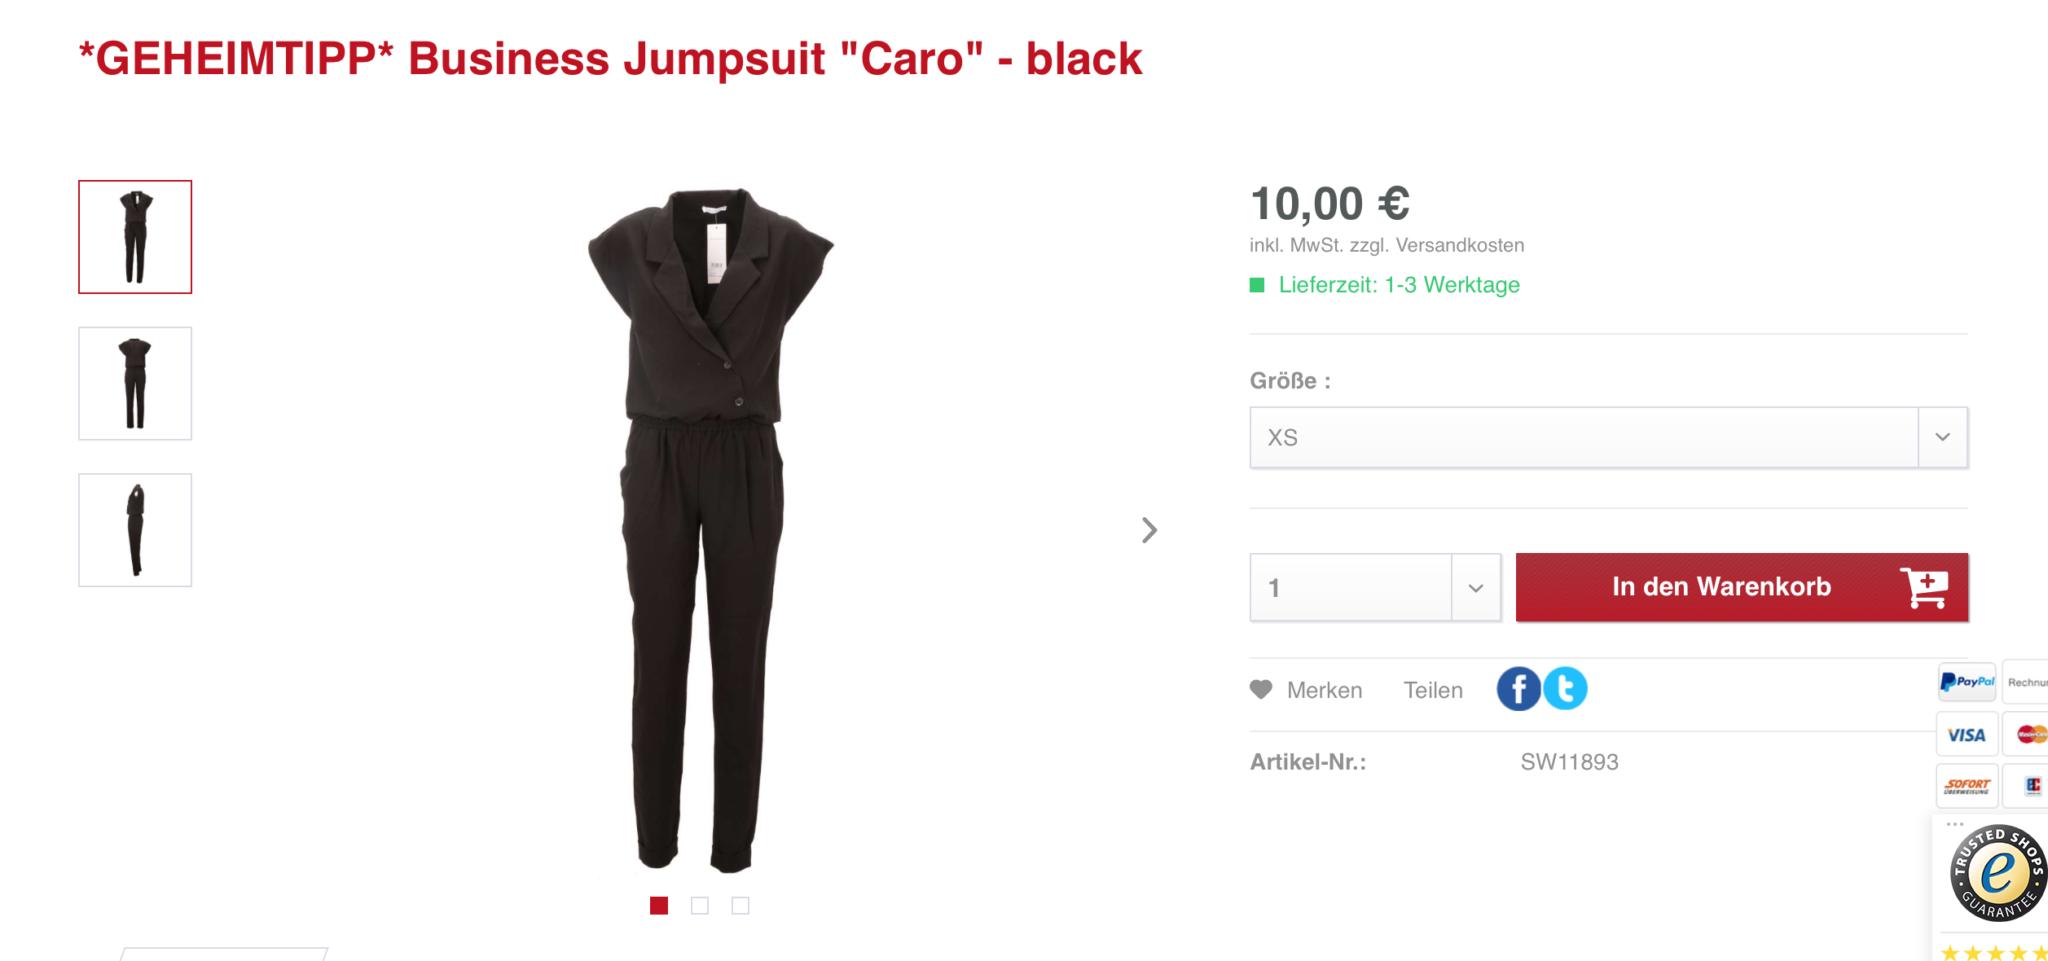 Hochwertige Kleidung bei alles10euro.de - Tanja's Everyday Blog